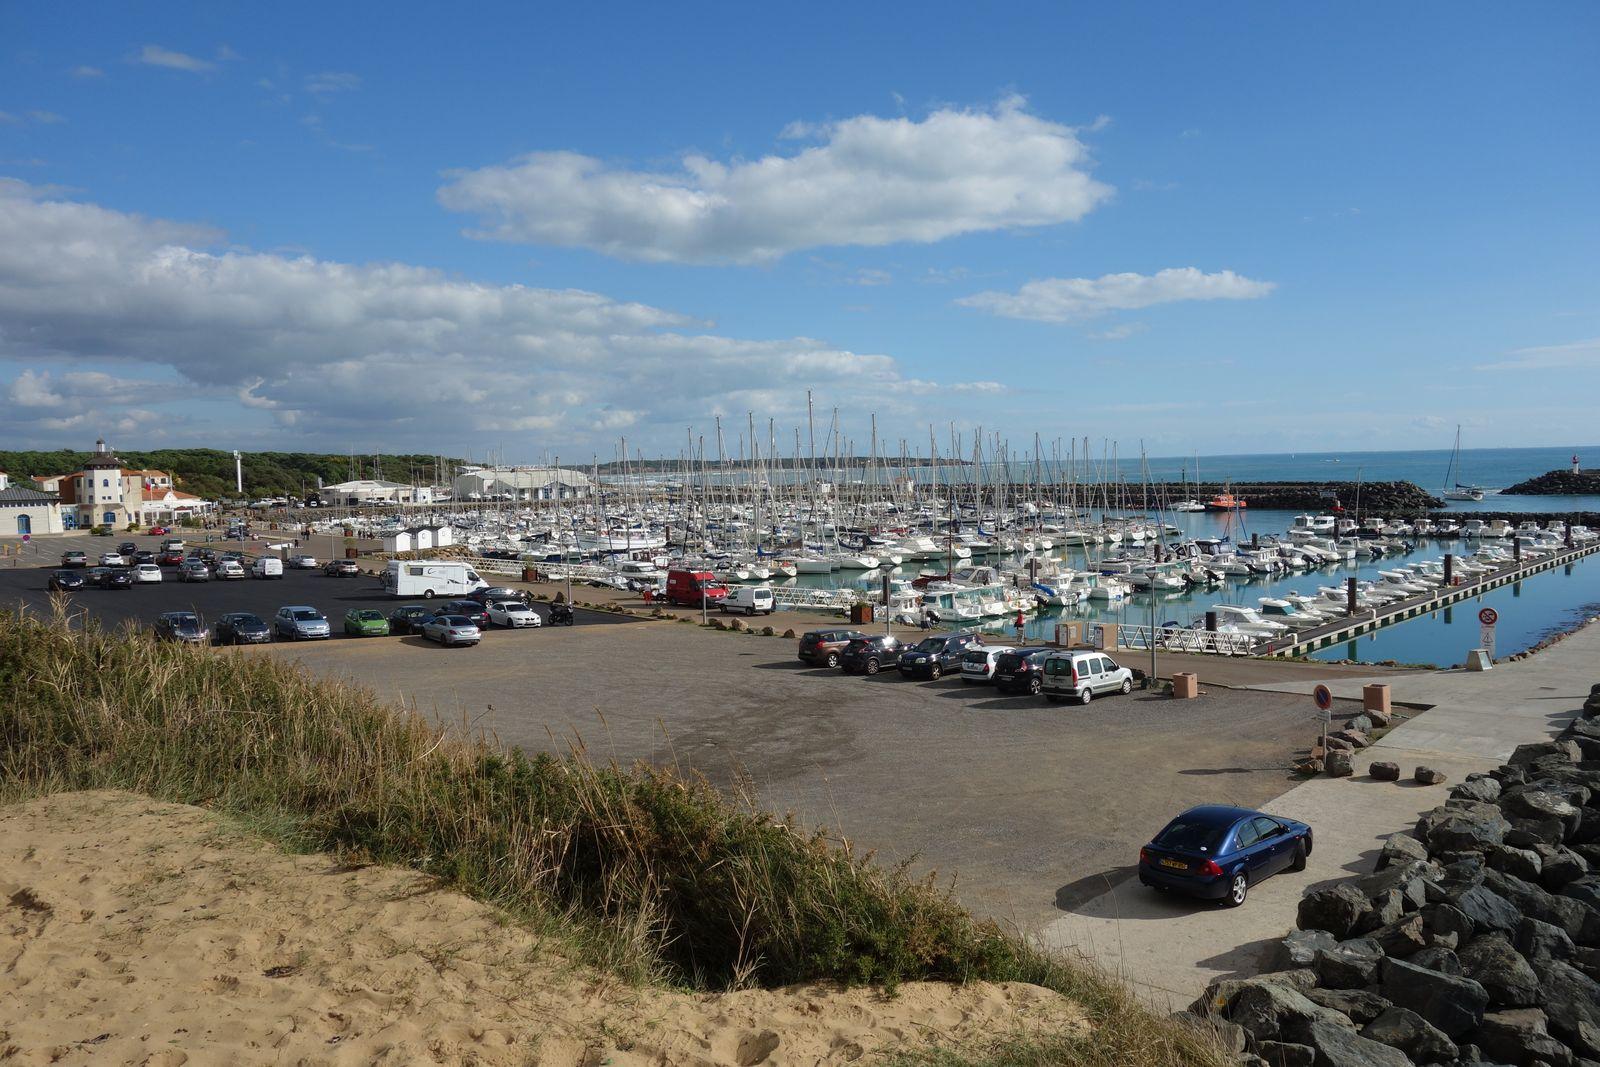 Le port de Bourgenay